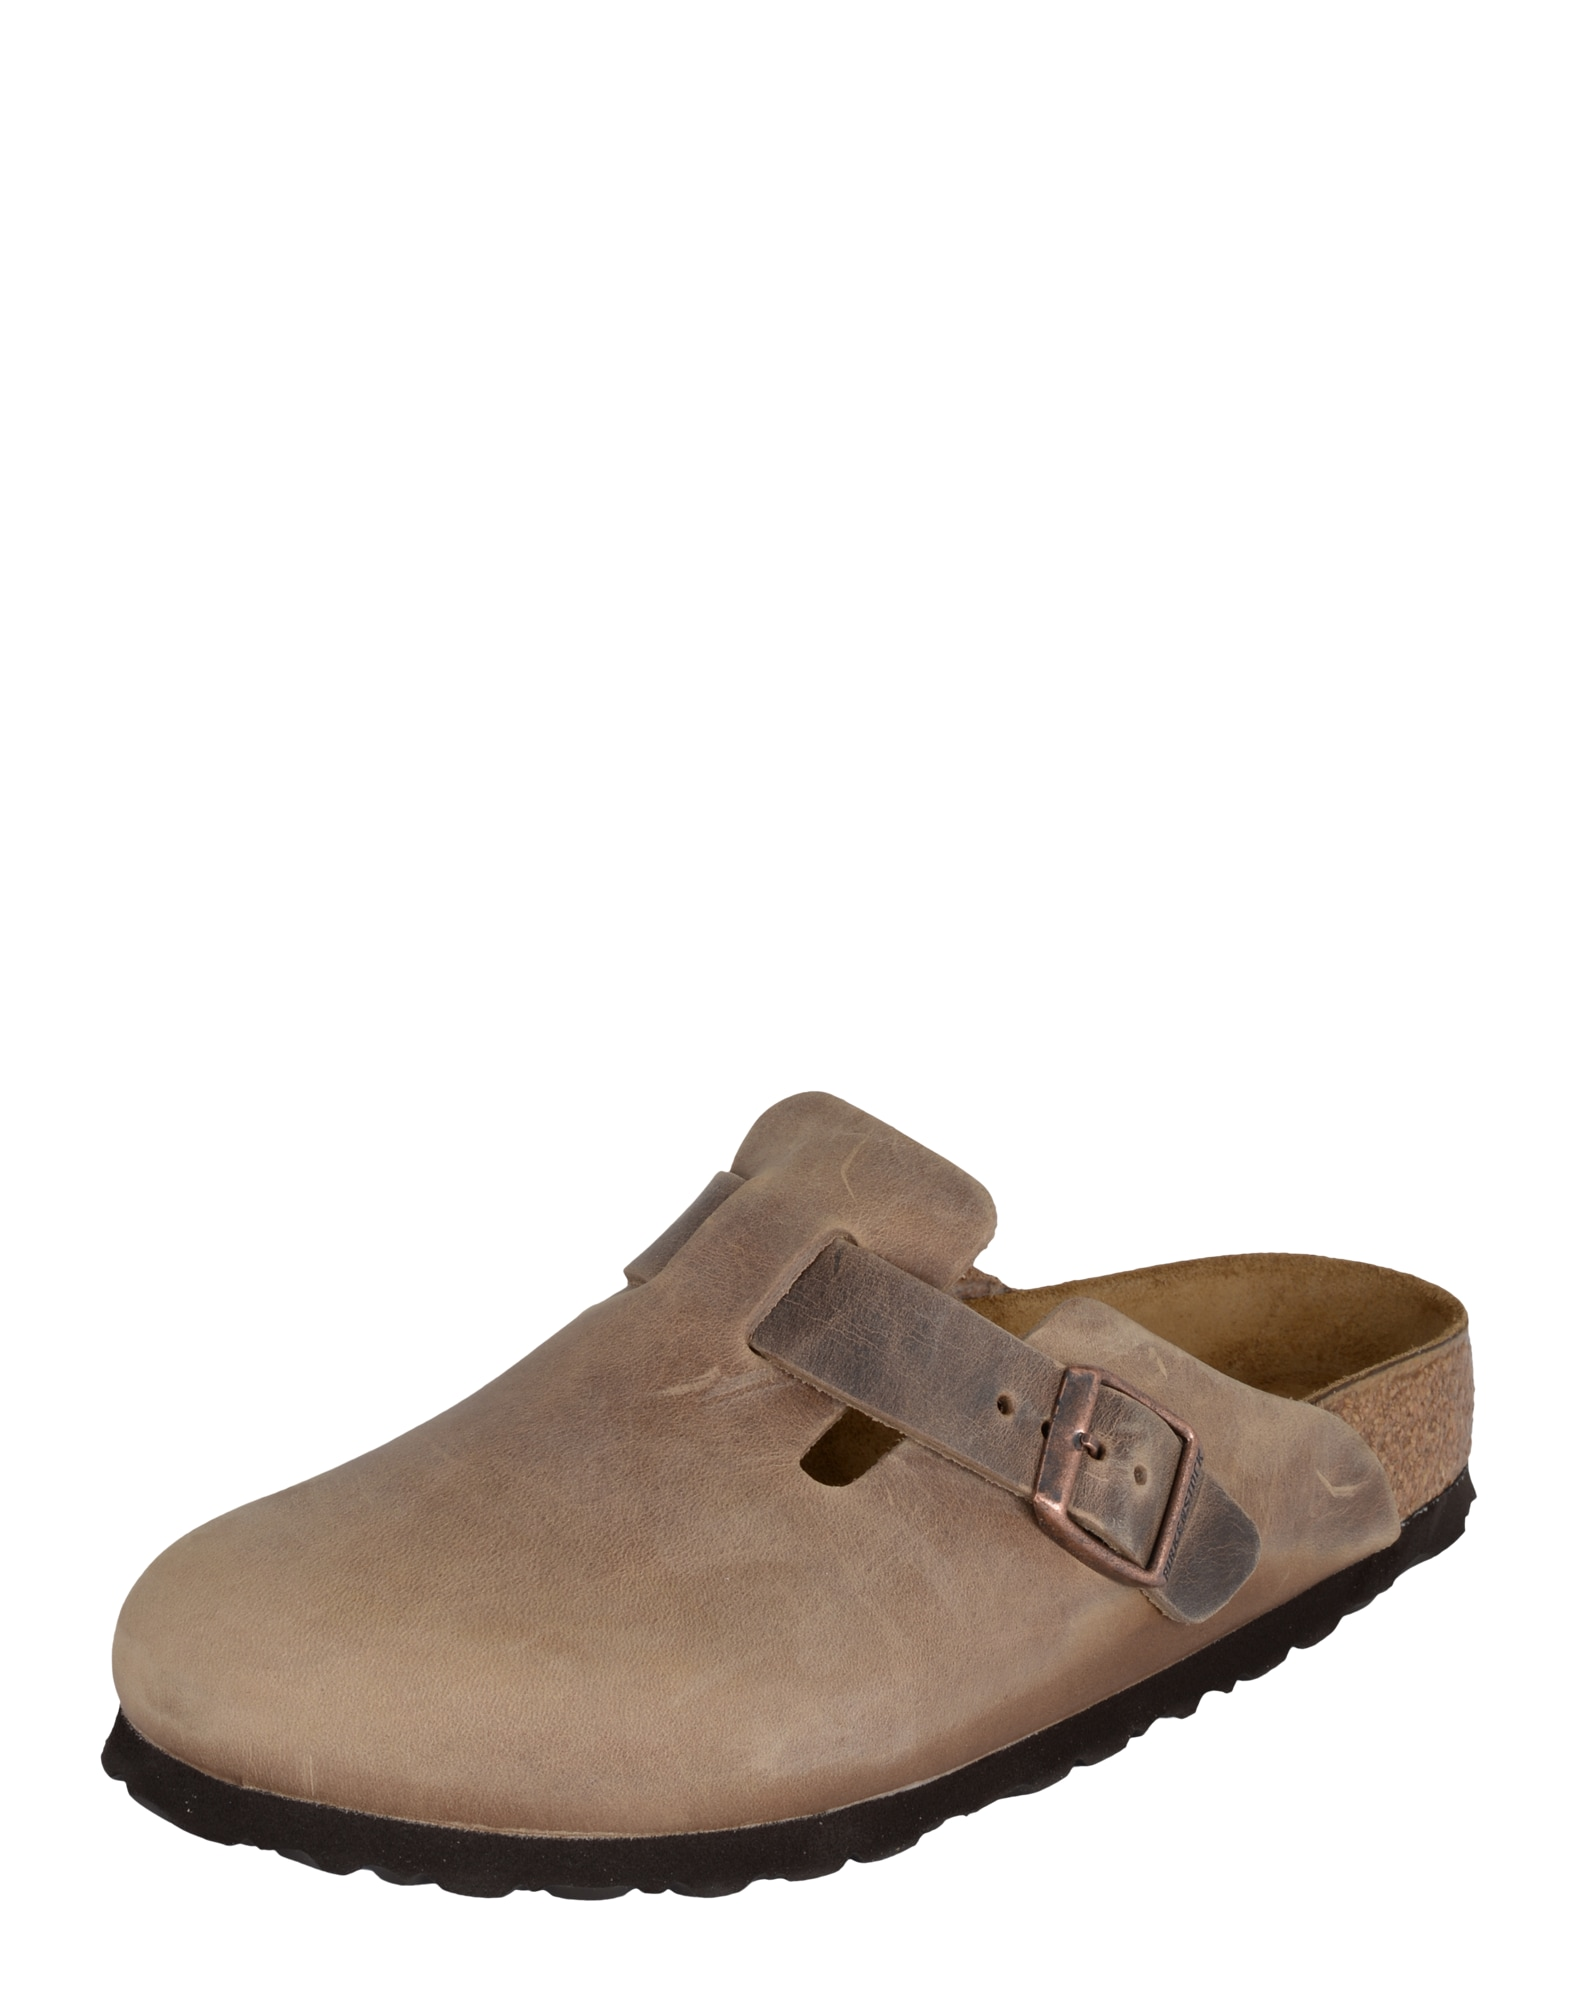 Clogs 'Boston' | Schuhe > Clogs & Pantoletten > Clogs | Braun | Birkenstock